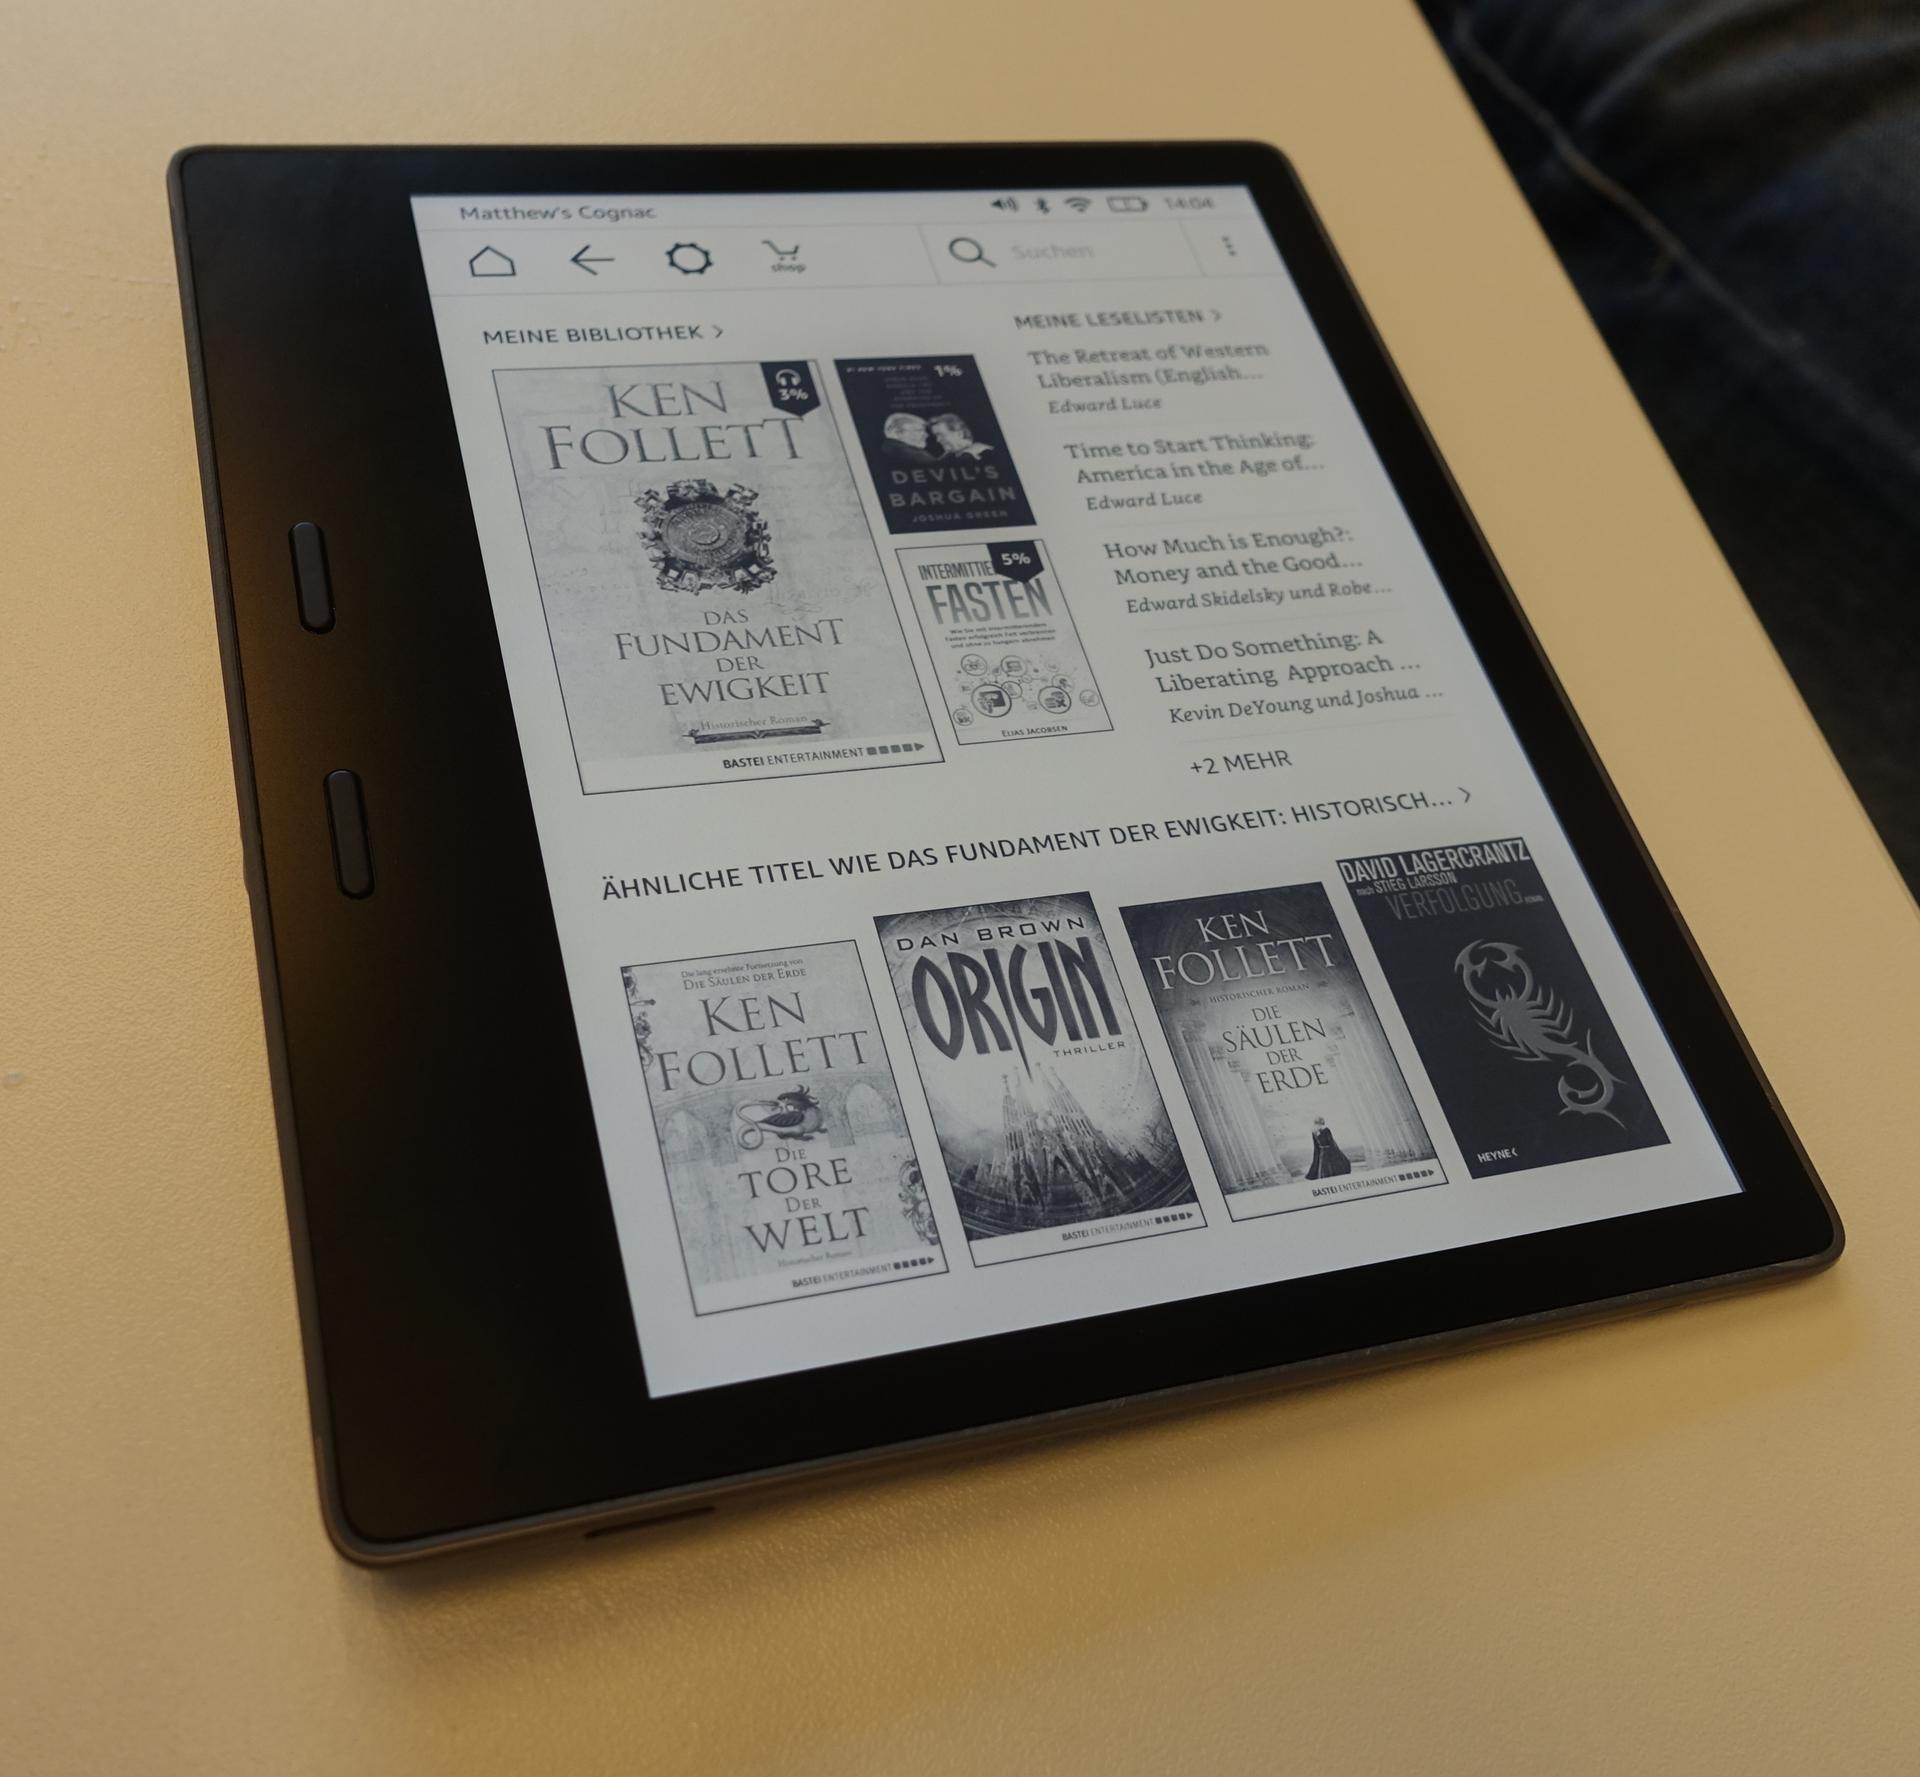 Neuer Kindle Oasis im Hands on: Amazons großer E-Book-Reader ist wasserdicht - Neuer Kindle Oasis (Bild: Ingo Pakalski/Golem.de)